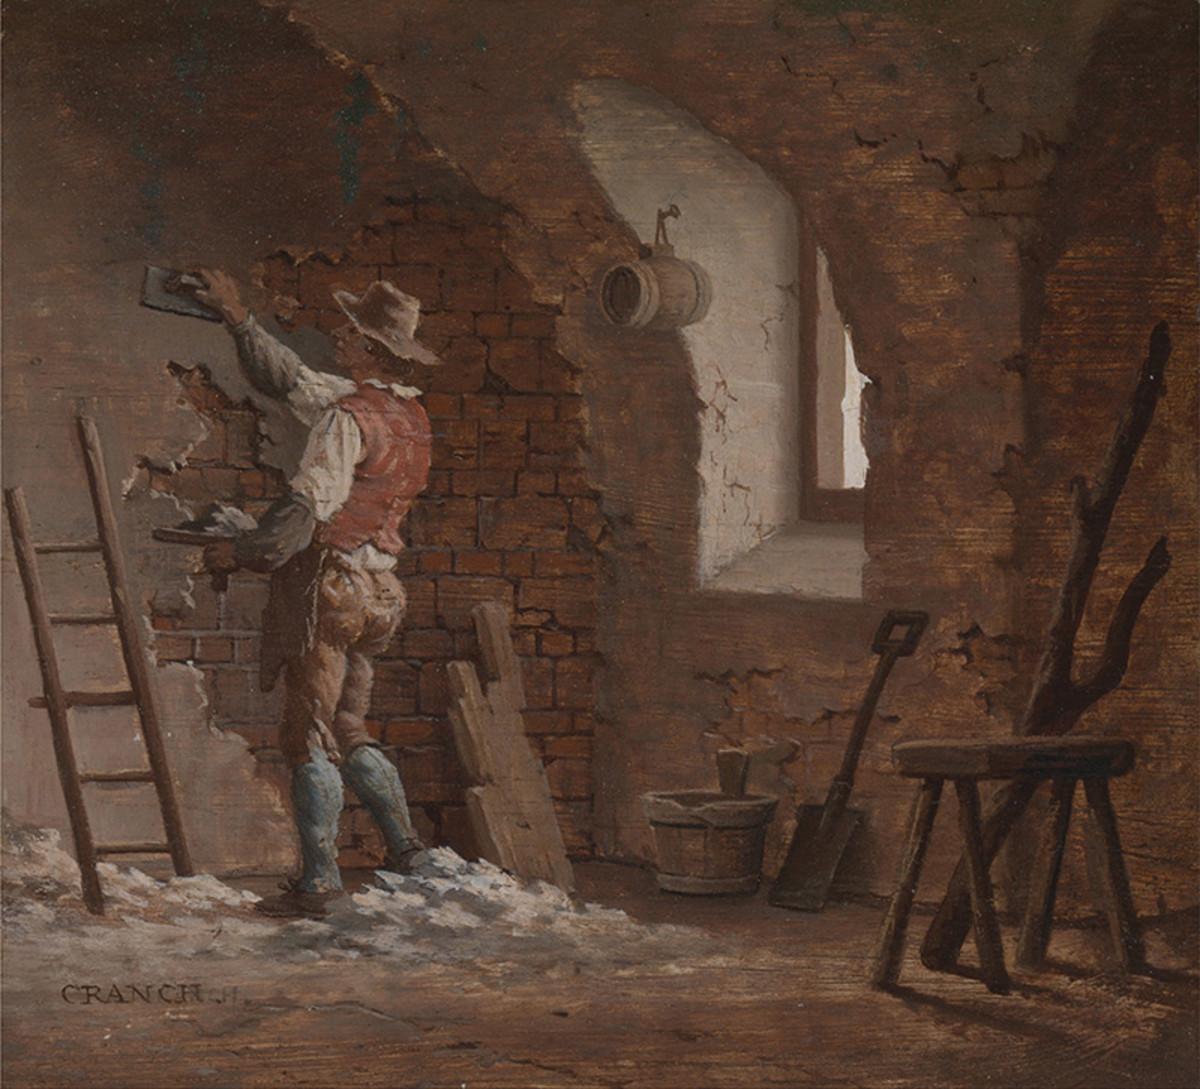 Plasterer, by John Cranch, 1807